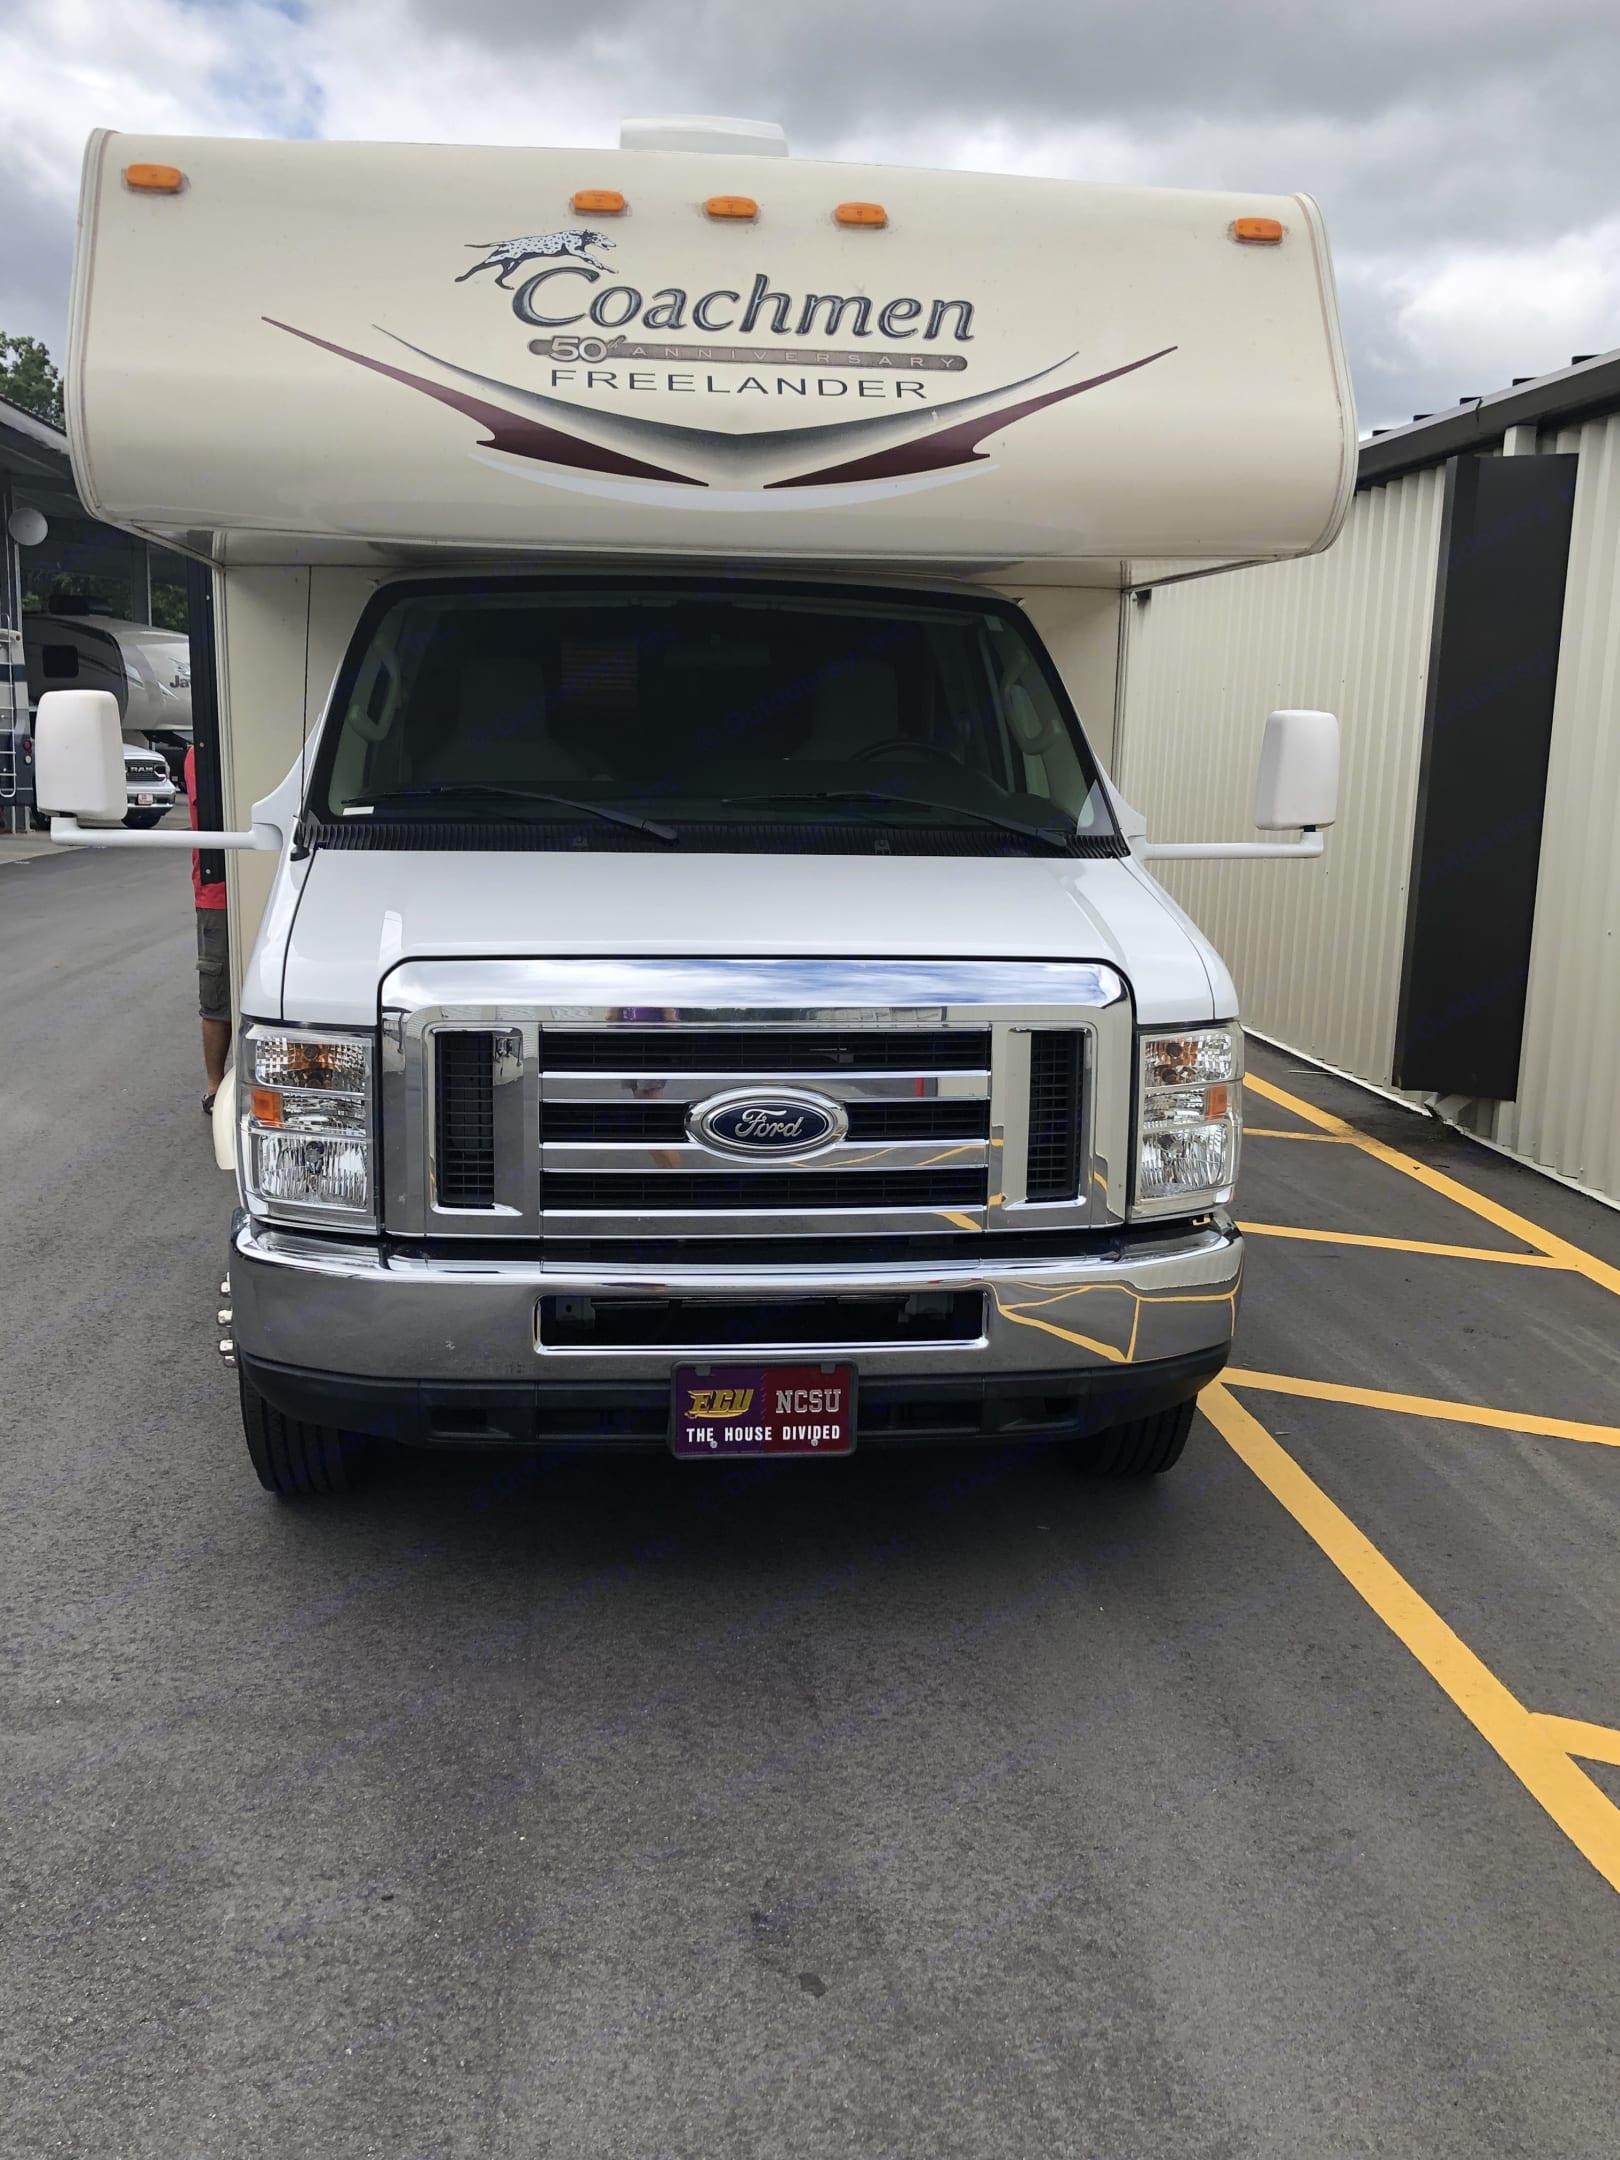 This engine will take you places!. Coachmen Freelander 2015